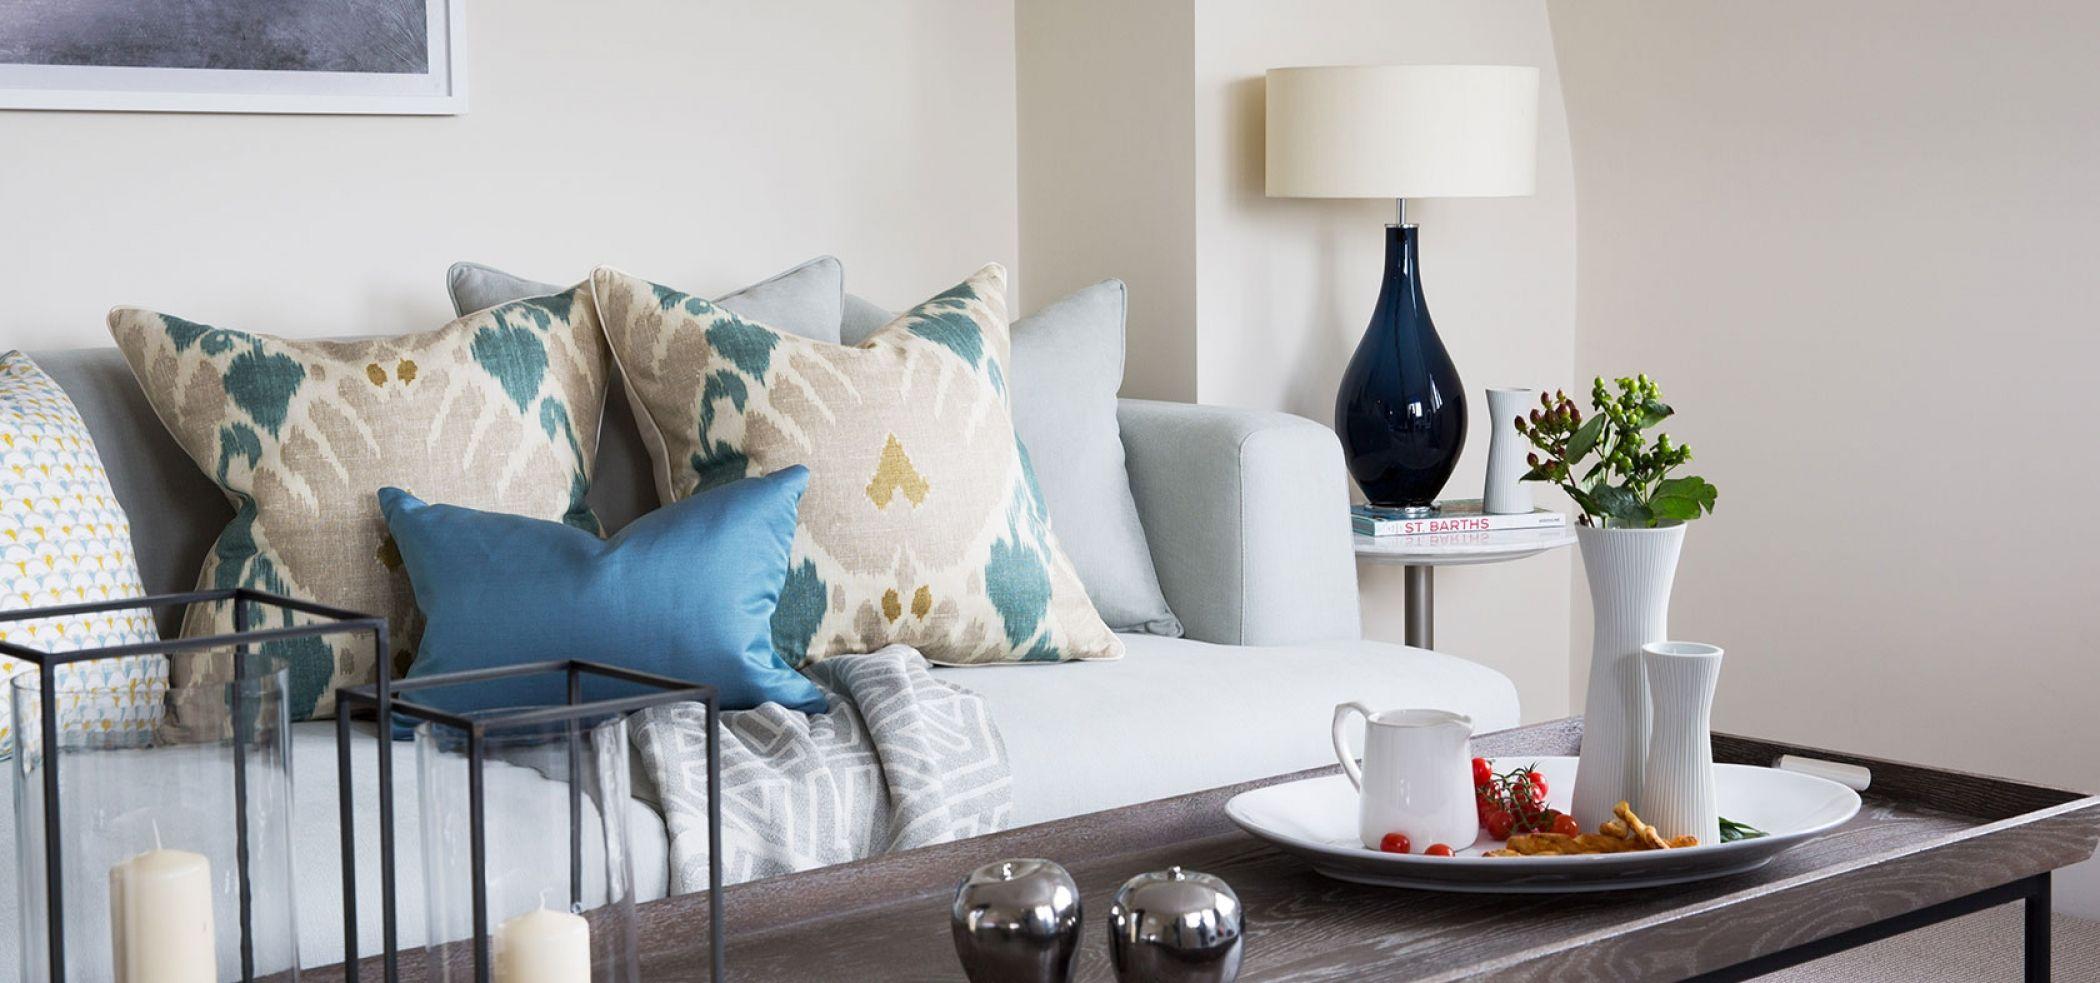 Serviced Apartments Interior Design   Belgravia London   th2 Designs ...